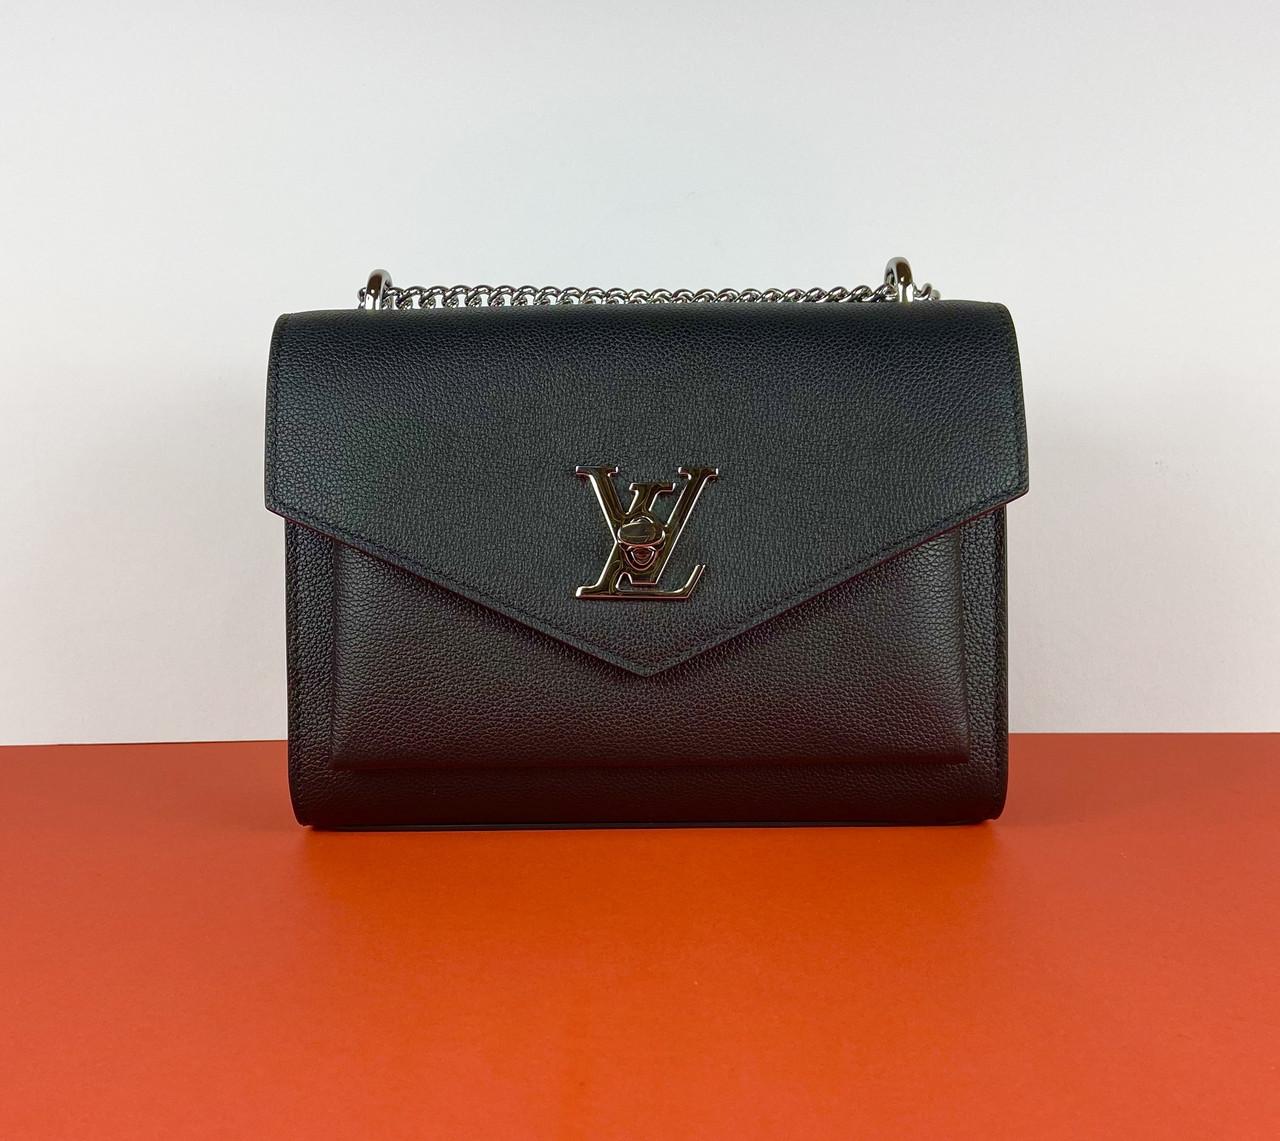 Сумка Mylockme BB Louis Vuitton (Луи Виттон) арт. 03-06